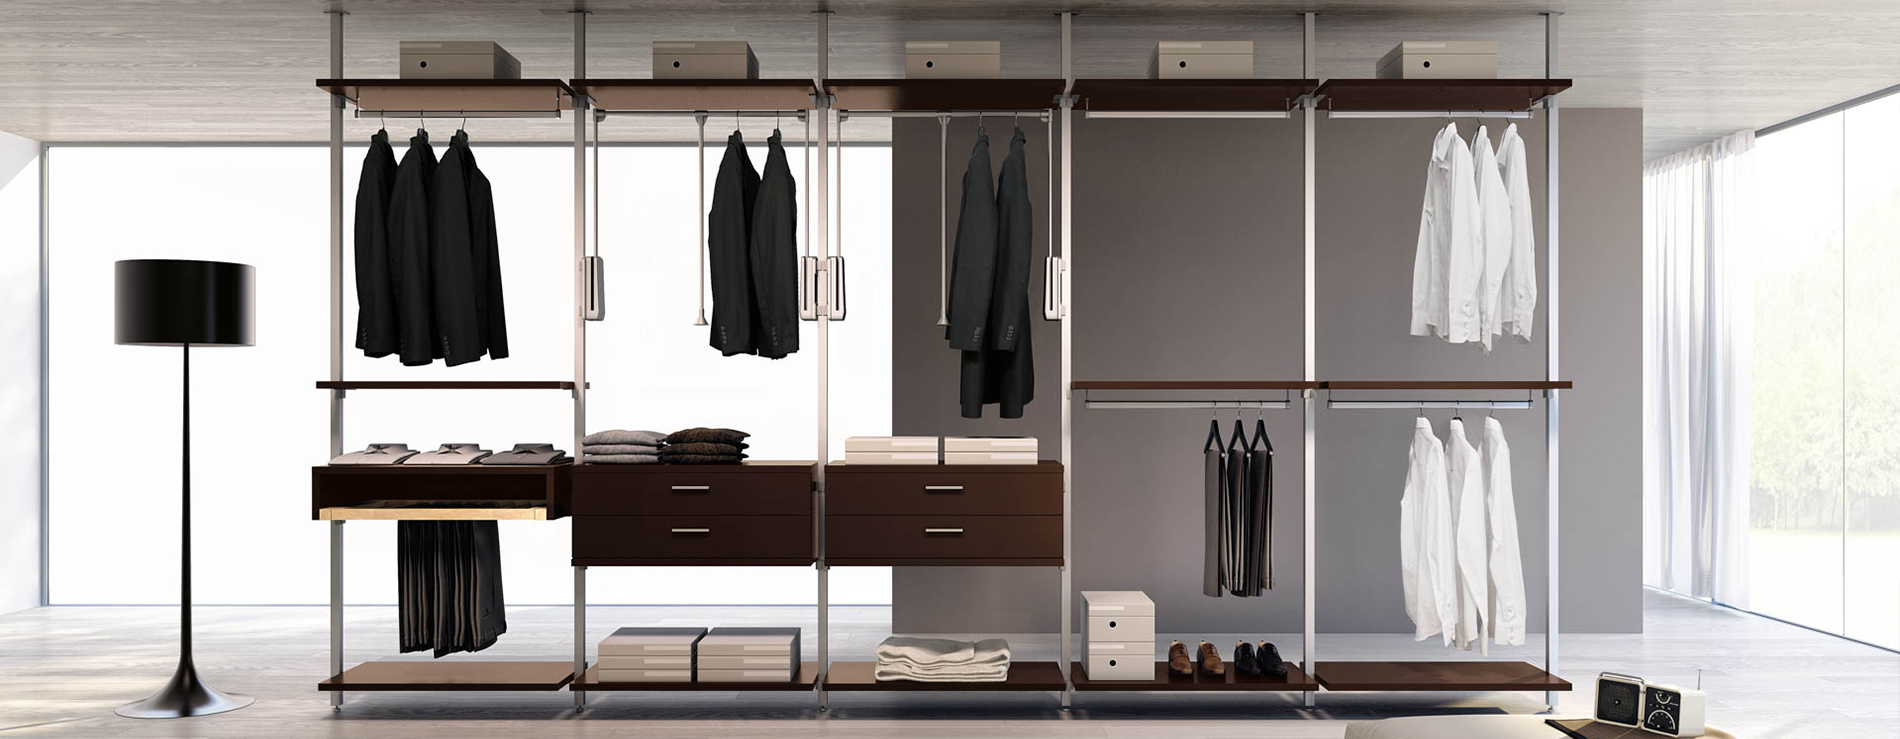 Cabina armadio 51 ferri mobili centro mobili - Mobili per cabina armadio ...